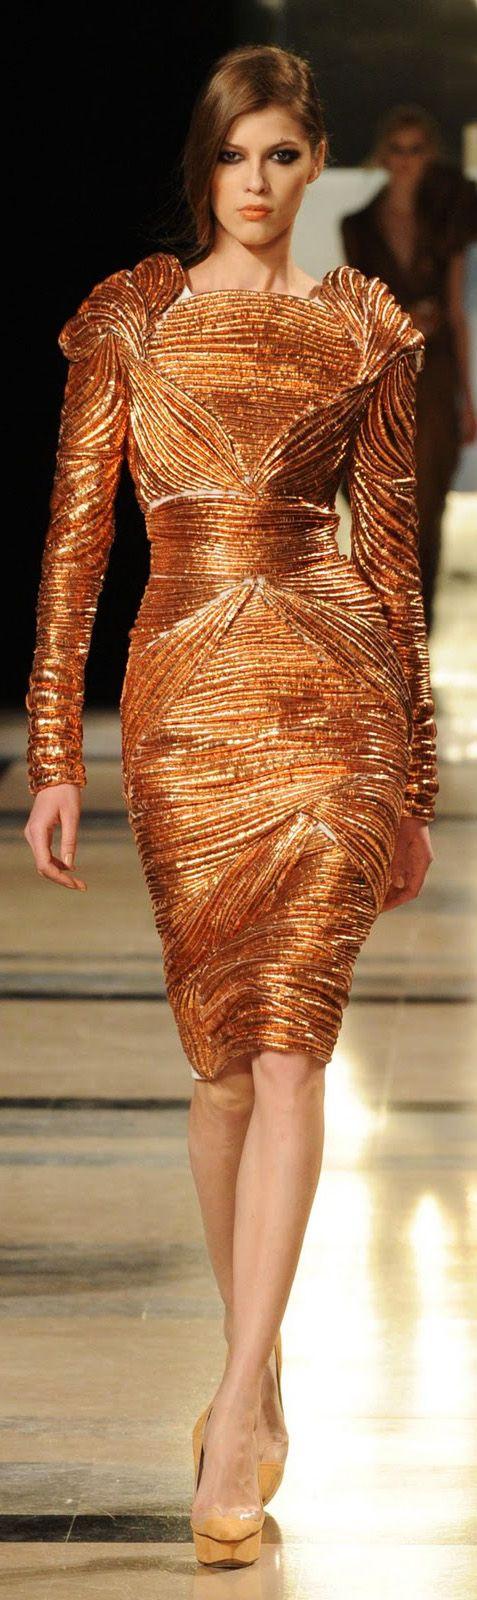 Stephane Rolland http://www.fashion2dream.com/#!fashion-video/c1zvd #video